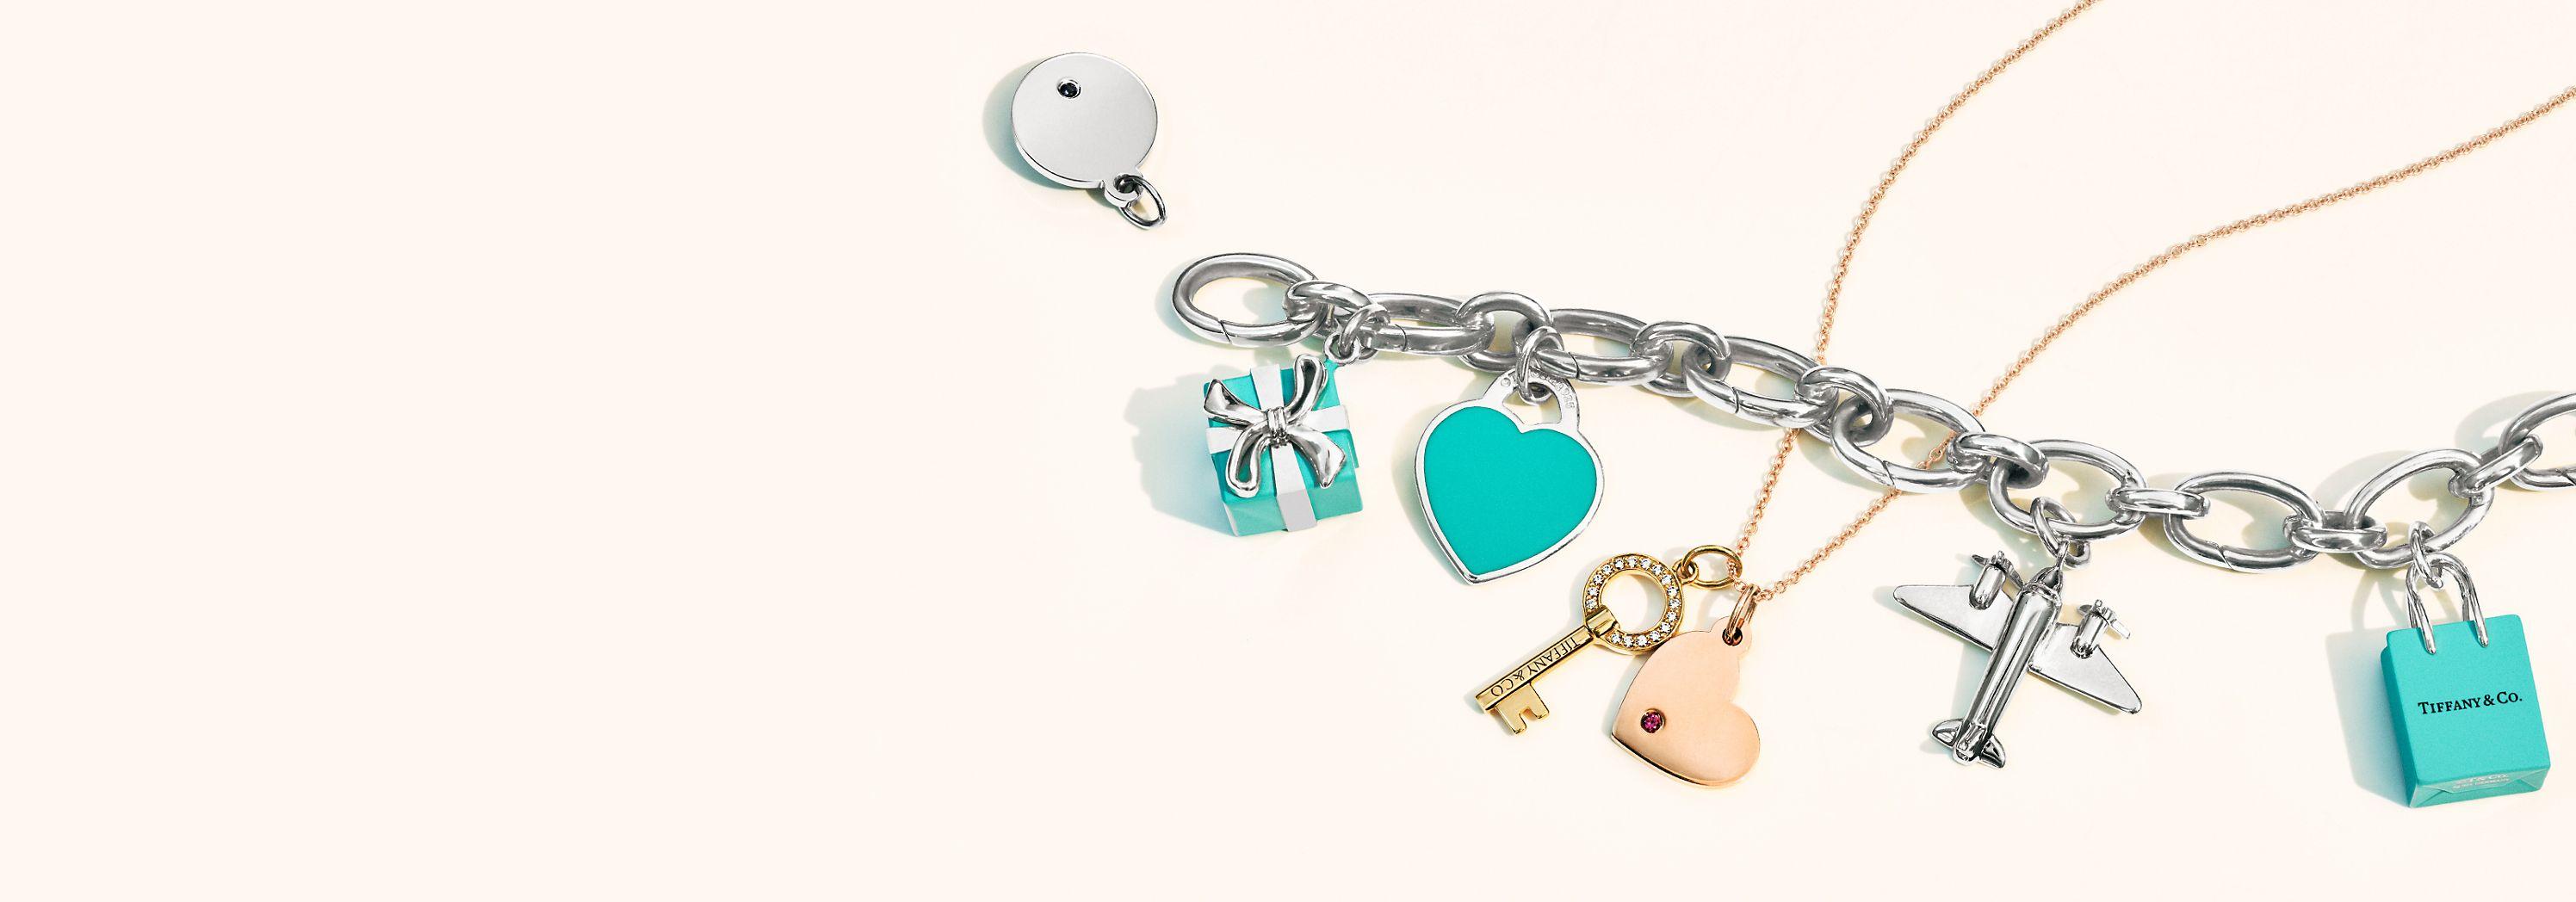 Personalization   Tiffany & Co